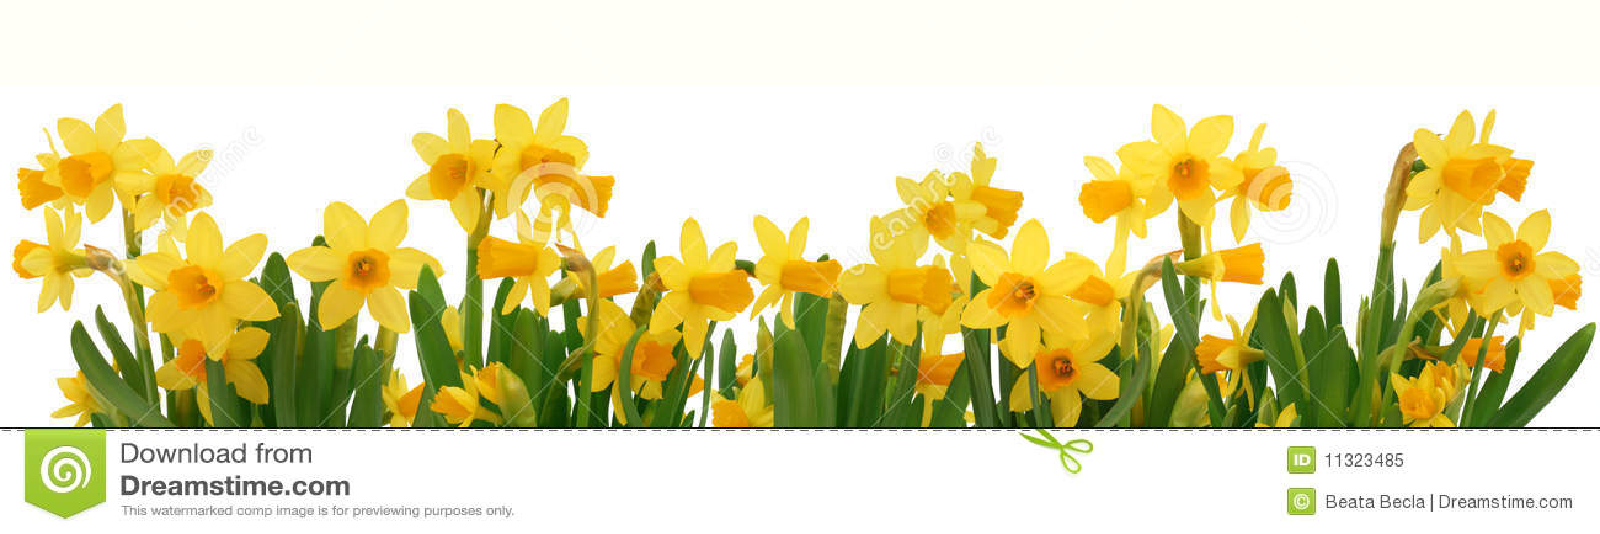 Beira dos daffodils da mola